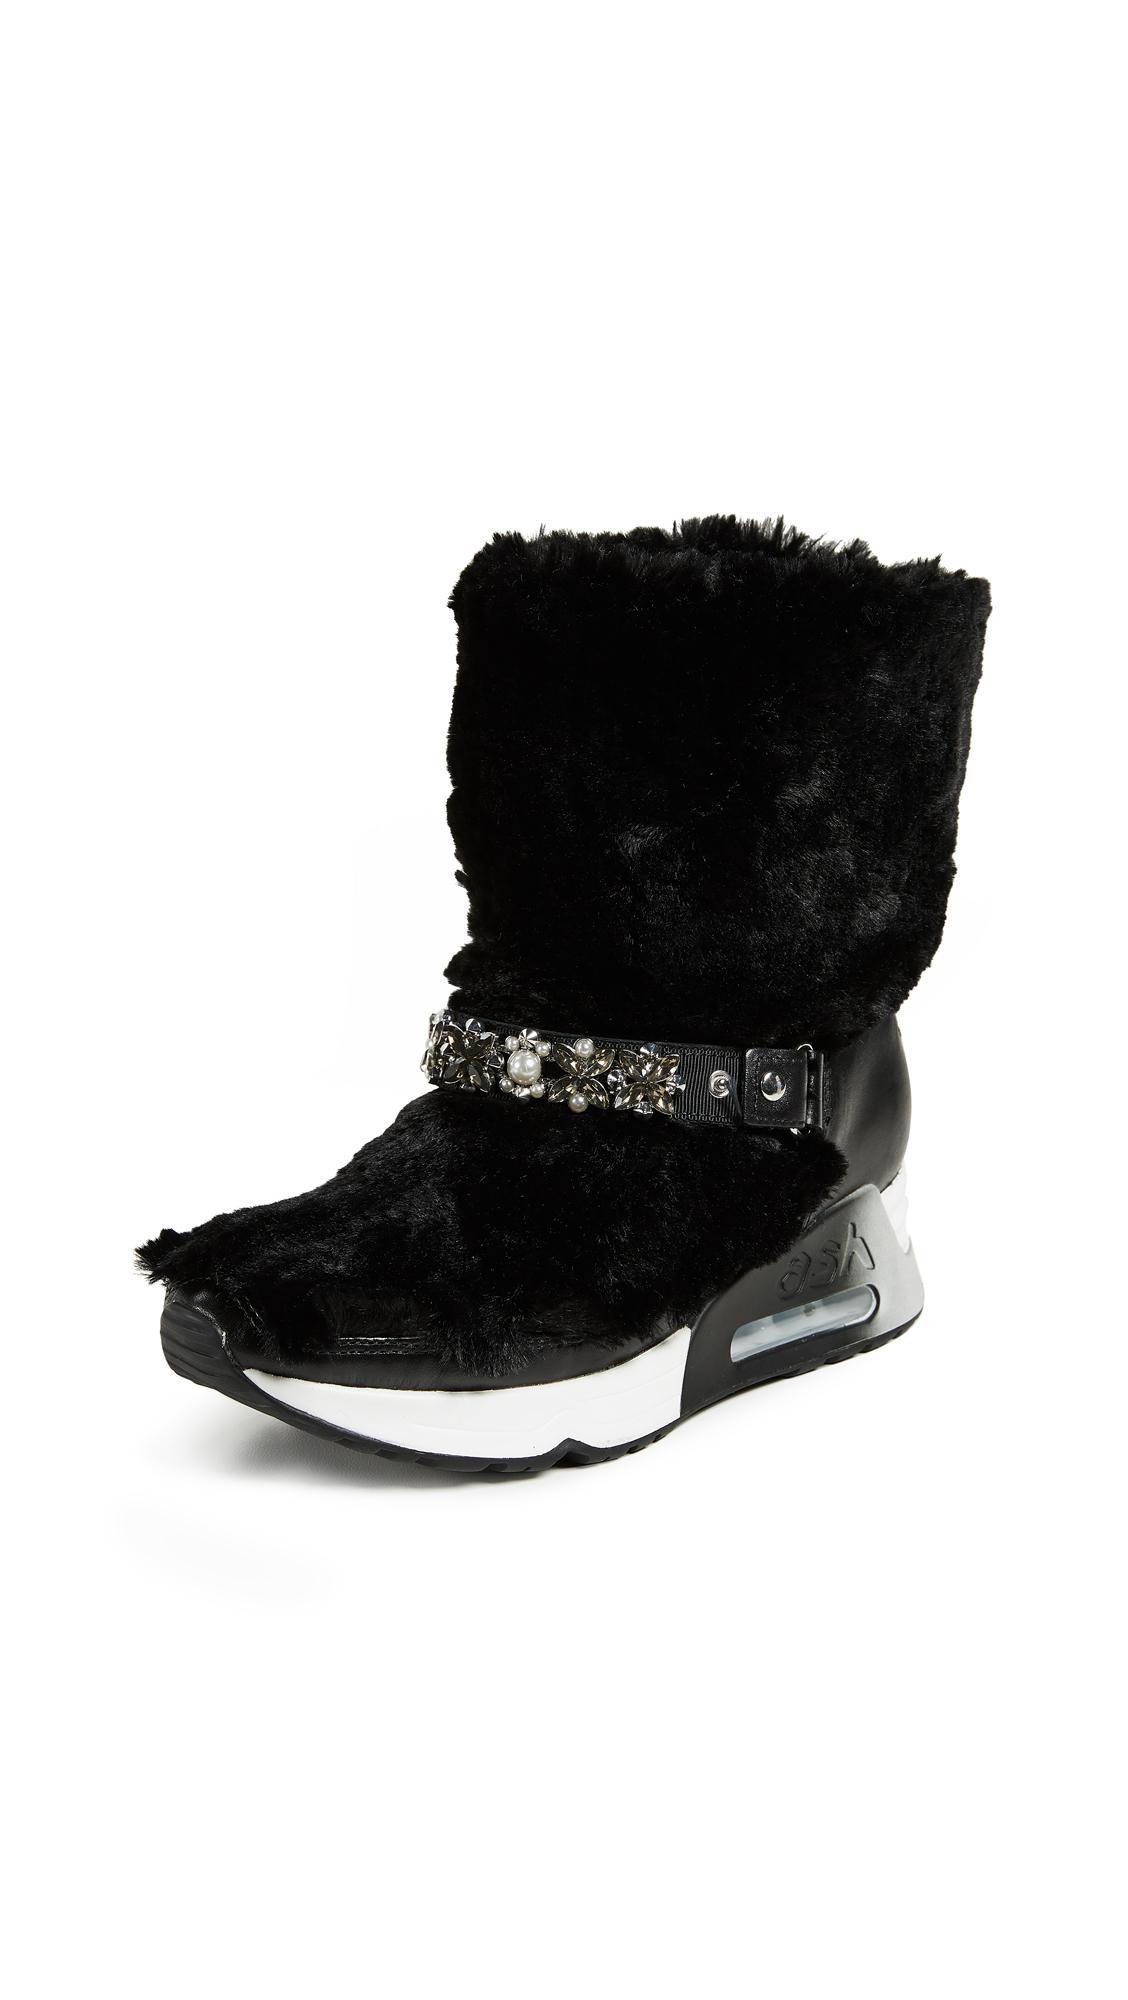 Ash Livya Boots - Black